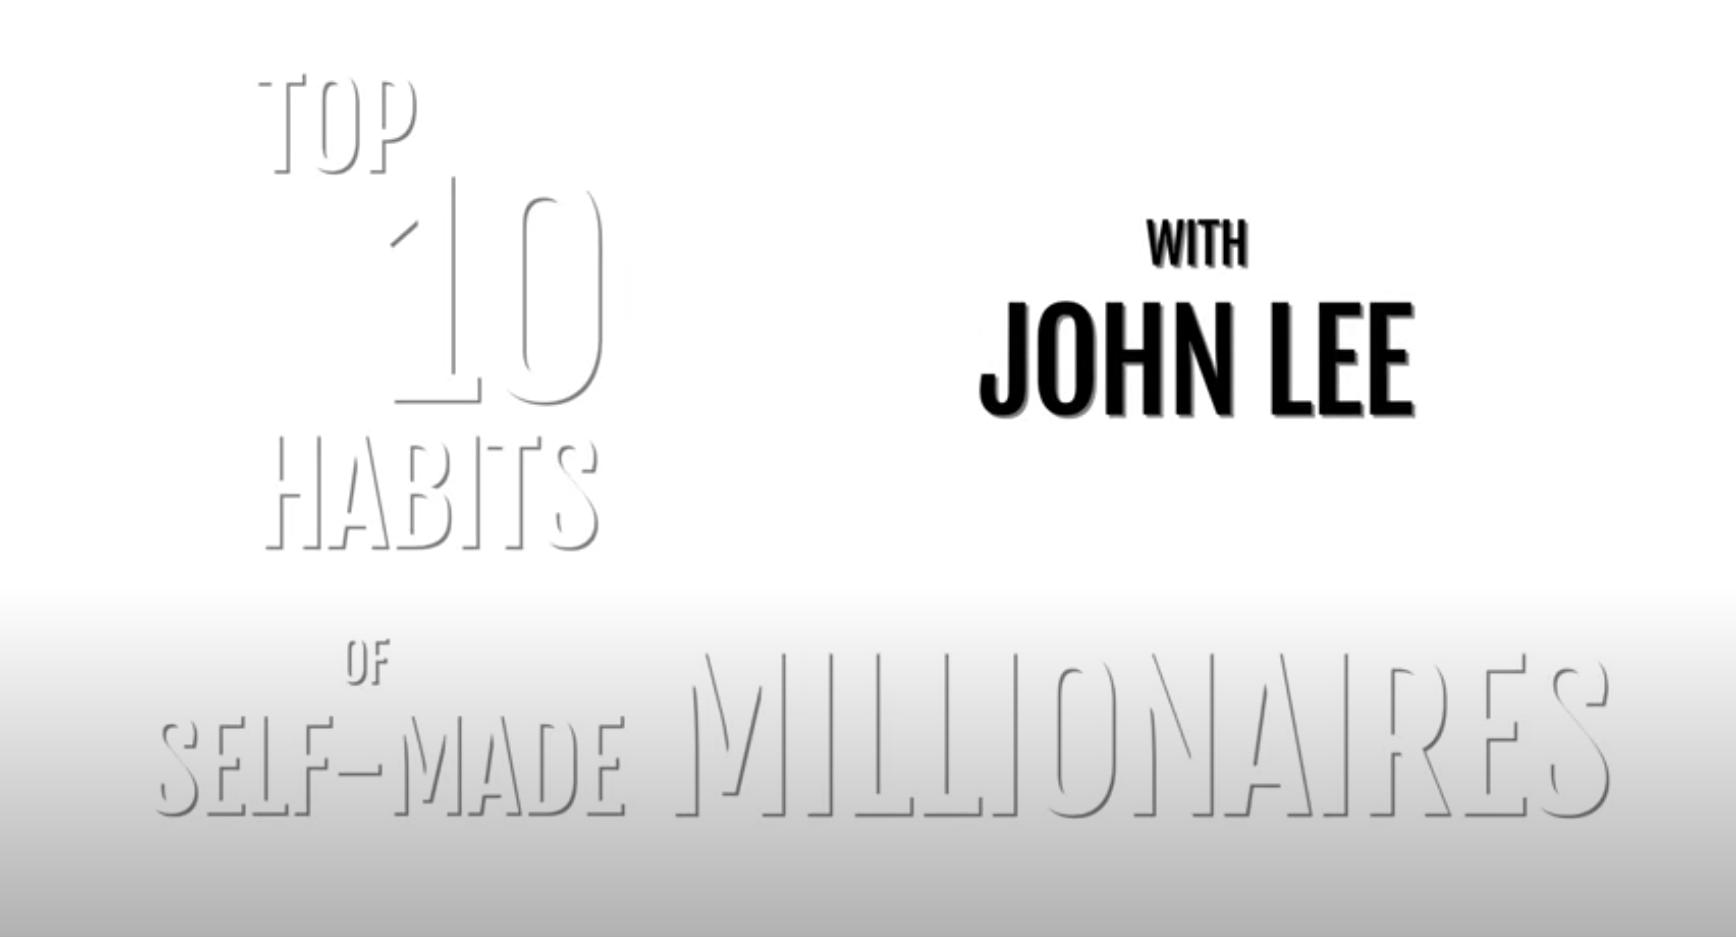 10 Habits of Self-Made Millionaires - John Lee